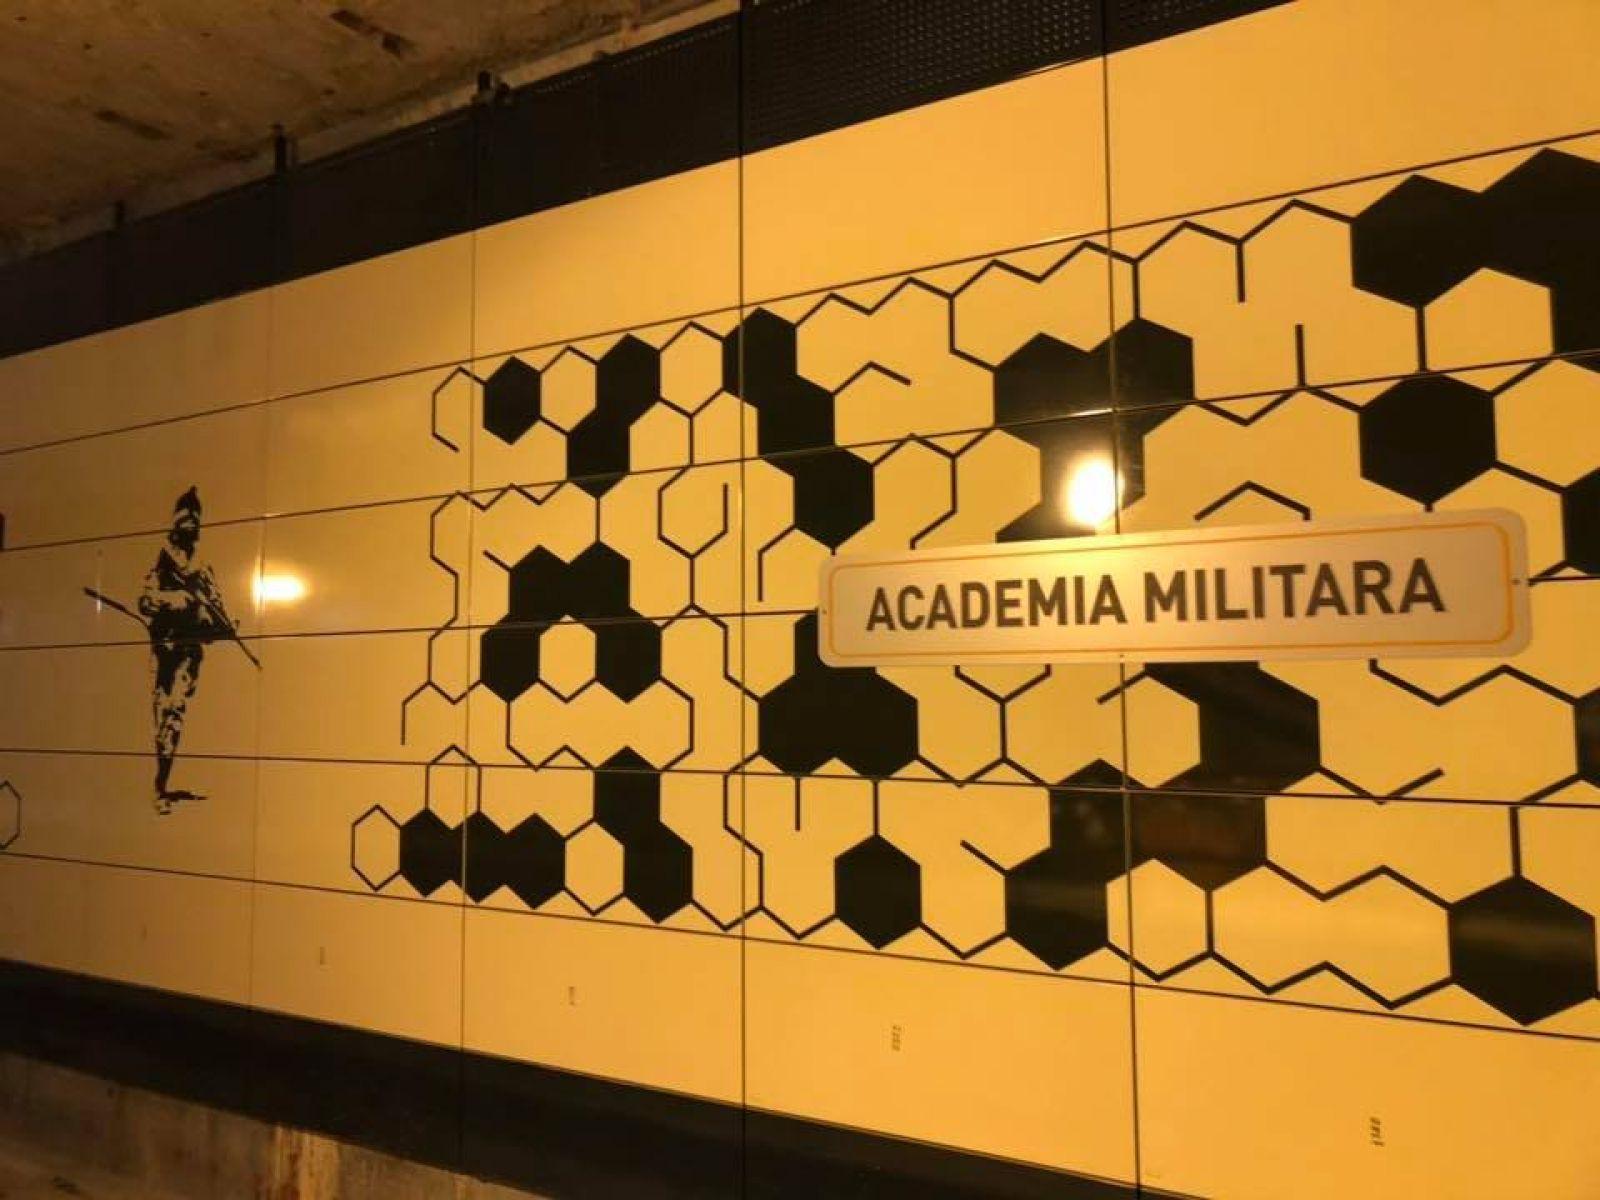 Inauguration of the metro station from Cotroceni – Academia Militara